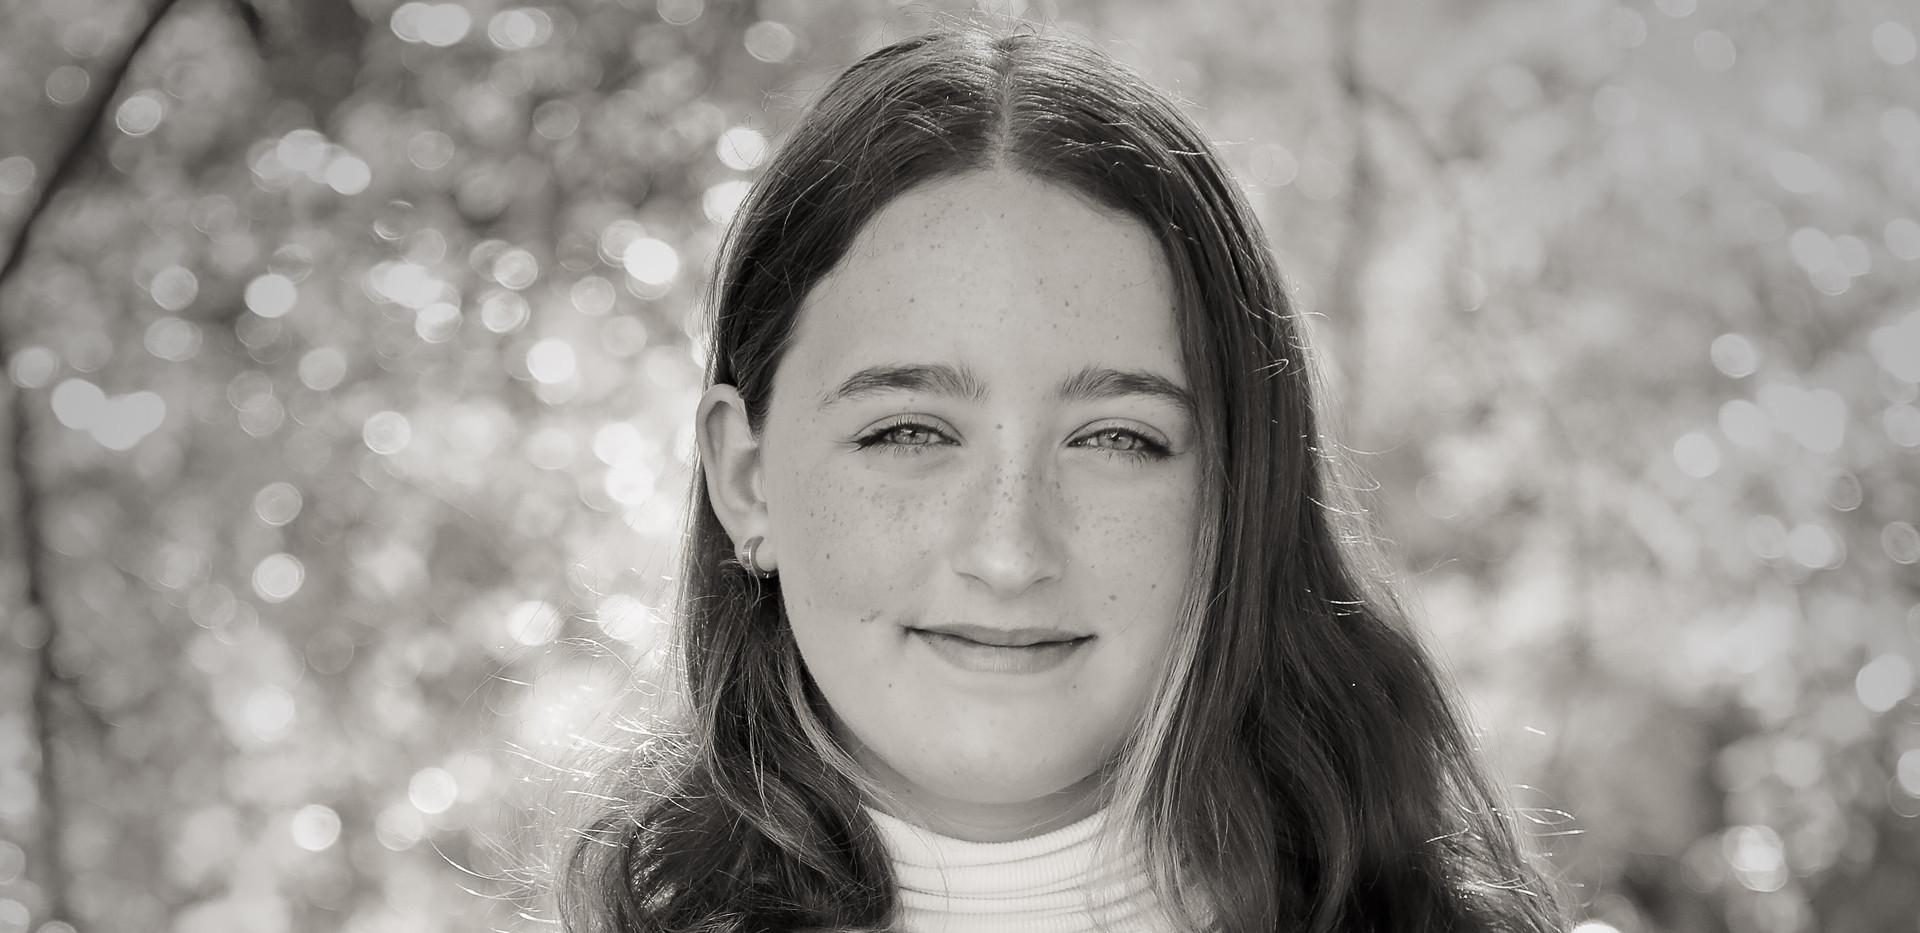 Teen portraits by professional photographer in Oakland Berkeley